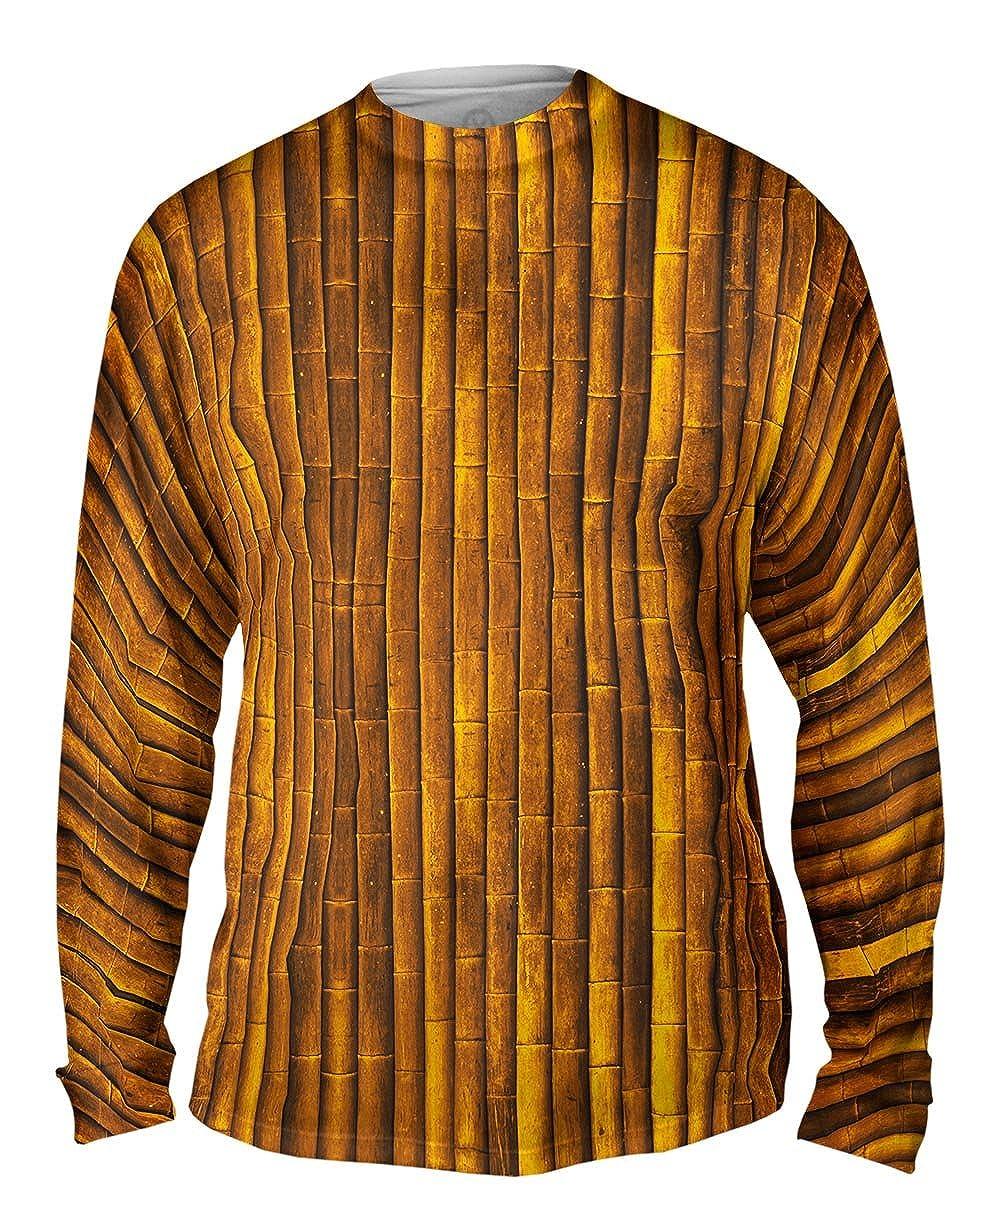 Yizzam Bamboo Wall TShirt Mens Long Sleeve